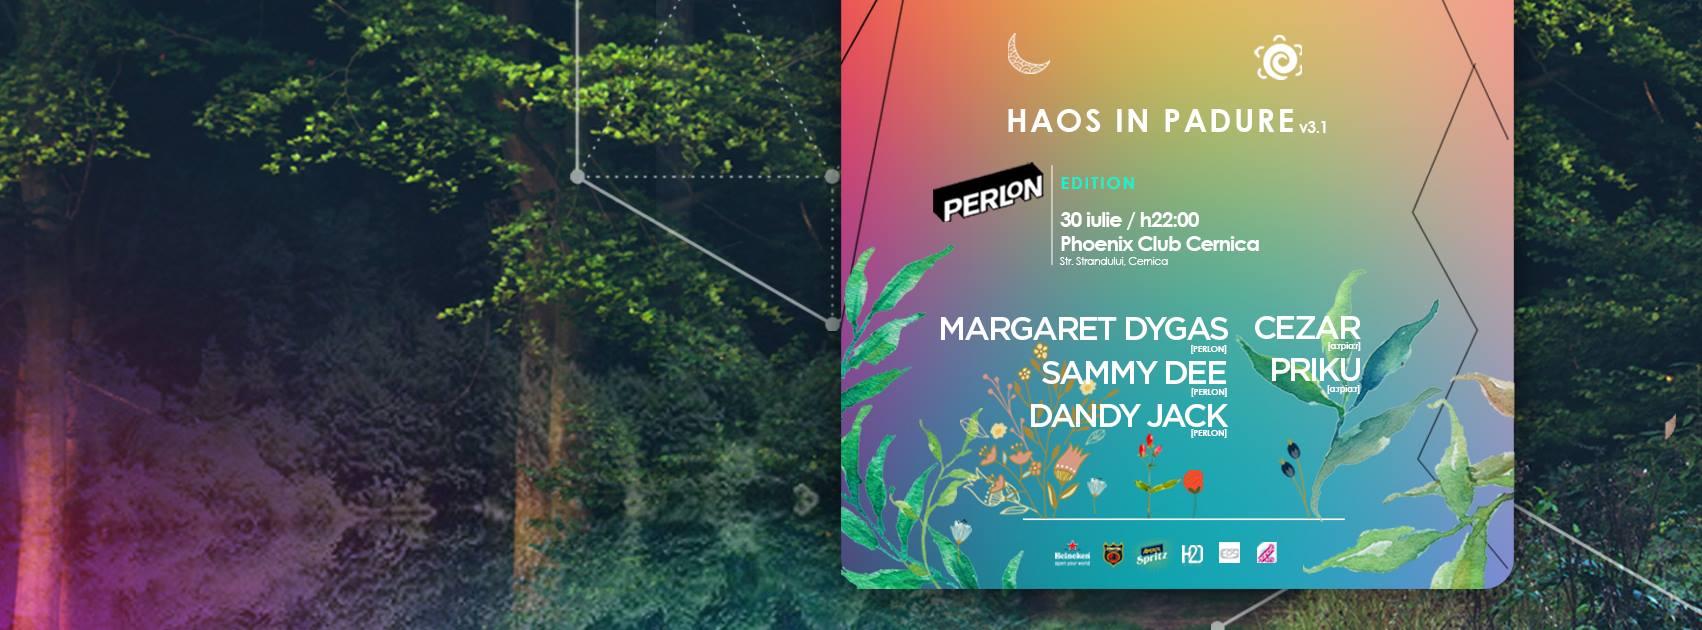 HAOS în Pădure v3.1 Perlon Edition w/ Margaret Dygas, Sammy Dee, Dandy Jack, Cezar, Priku @ Extreme Park Cernica